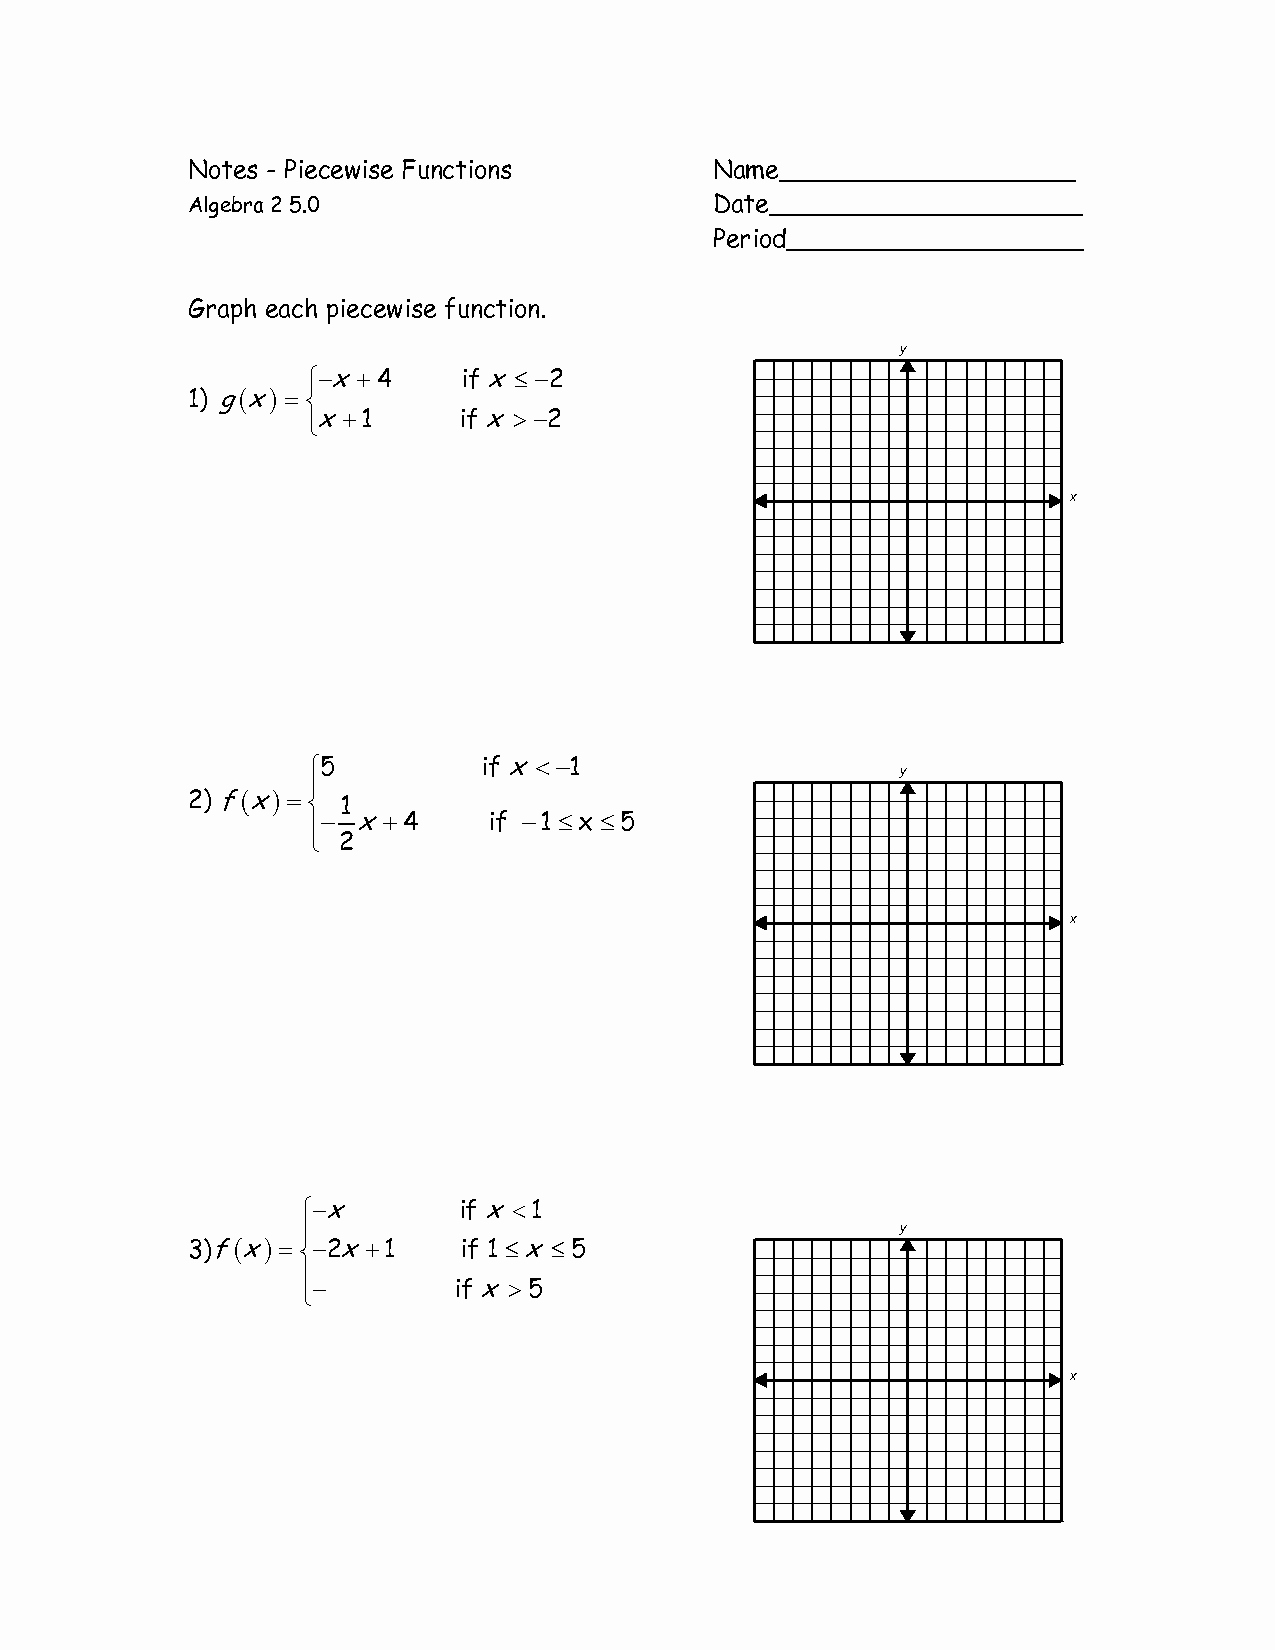 Piecewise Functions Worksheet Answer Key Fresh Graphs Of Piecewise Functions Worksheet Google Search